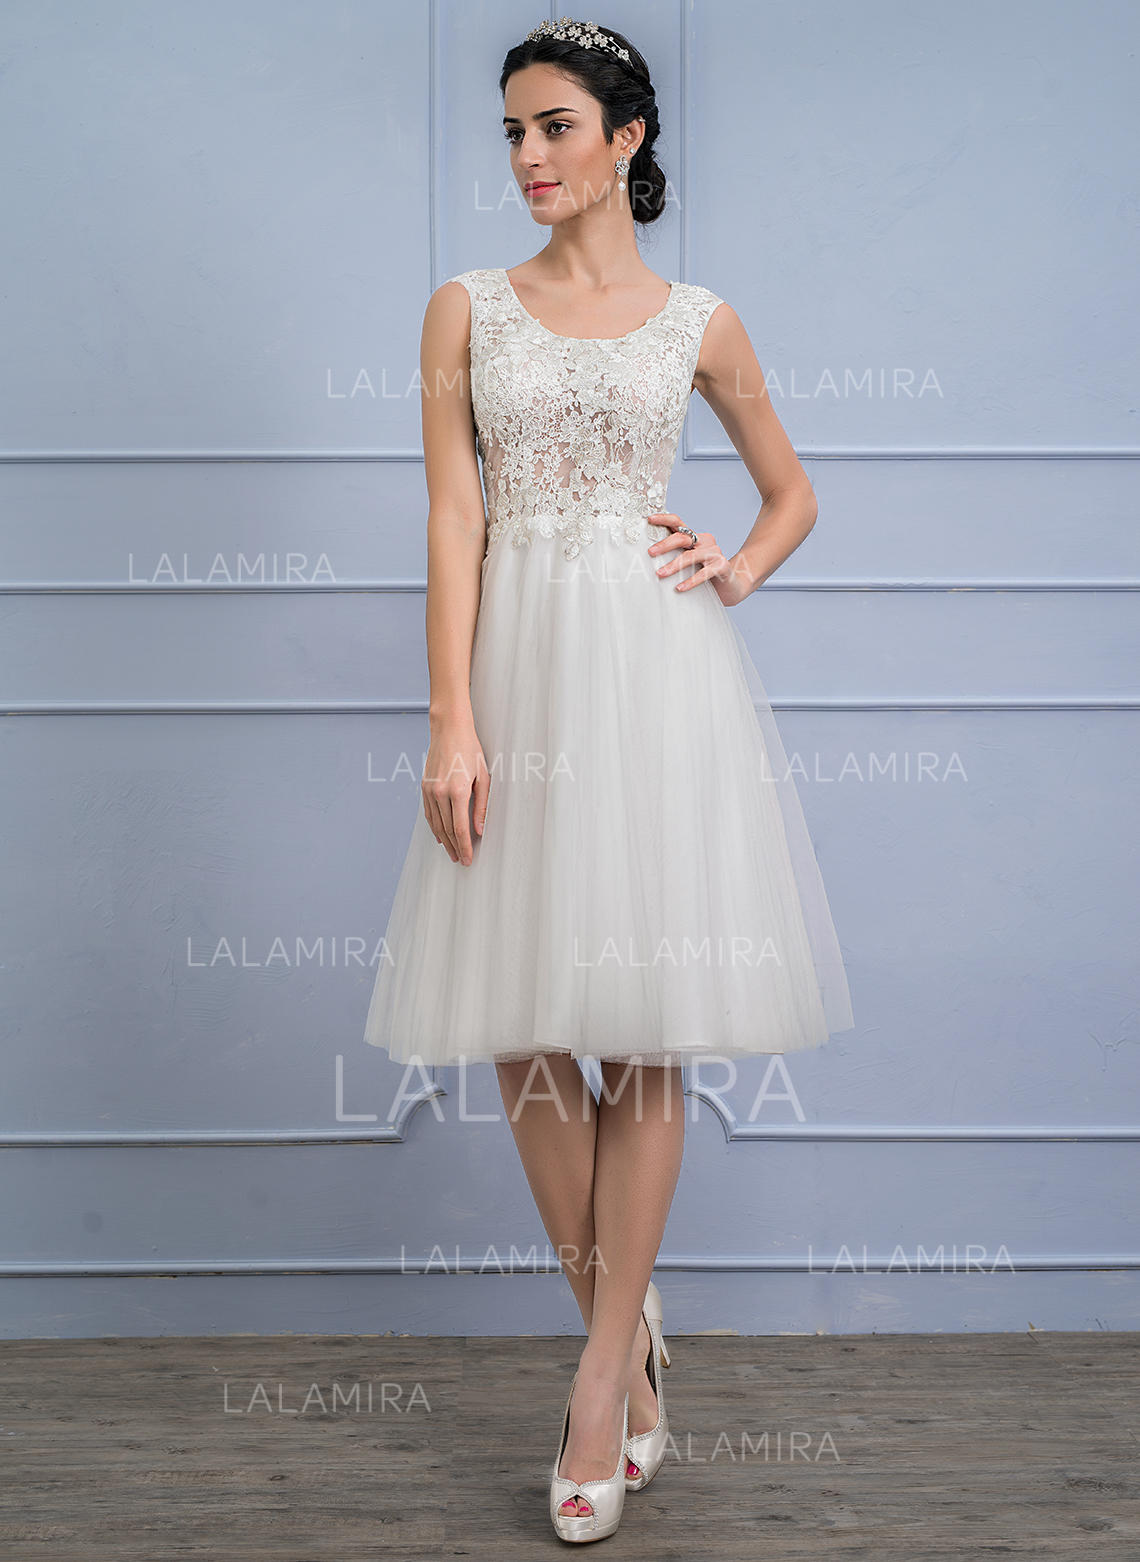 dbbc4de2f84 A-Line Princess Scoop Neck Knee-Length Tulle Lace Wedding Dress (002107842.  Loading zoom